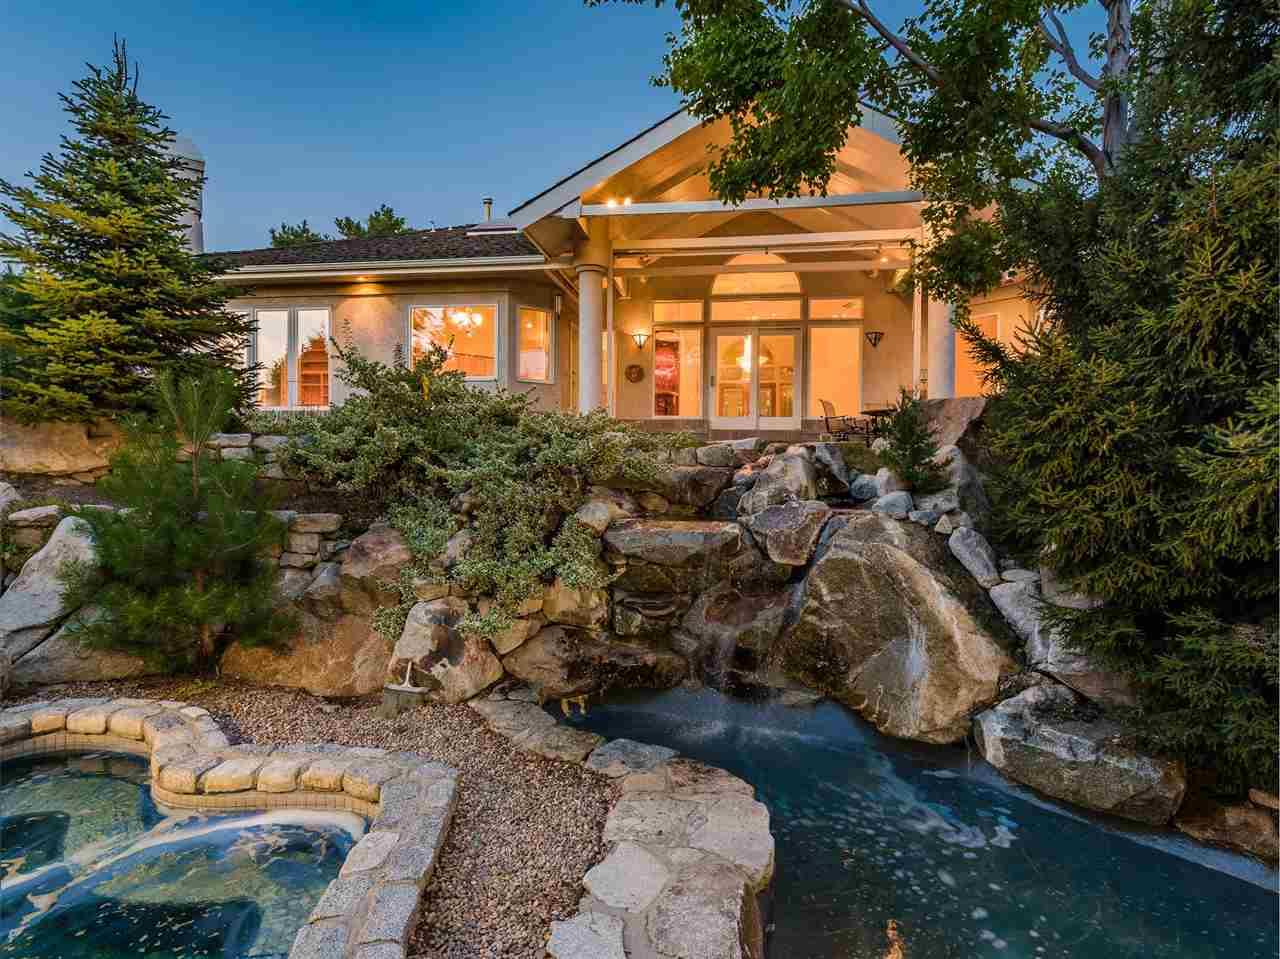 Single Family Home for Sale at 2277 Longview Place, Boise 2277 N Longview Pl Boise, Idaho 83702